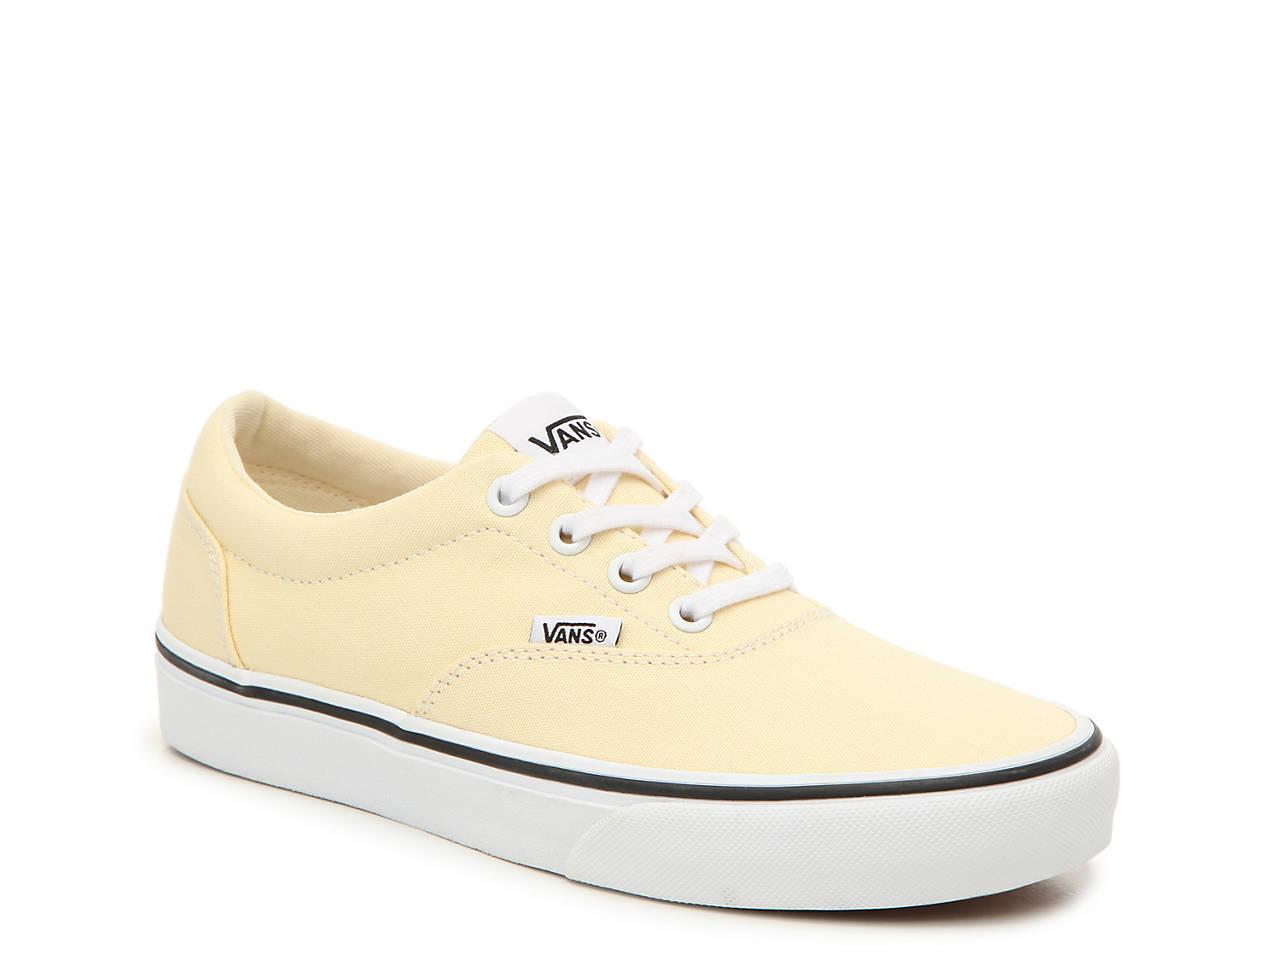 1b2af208702 Vans Doheny Sneaker - Women s Women s Shoes